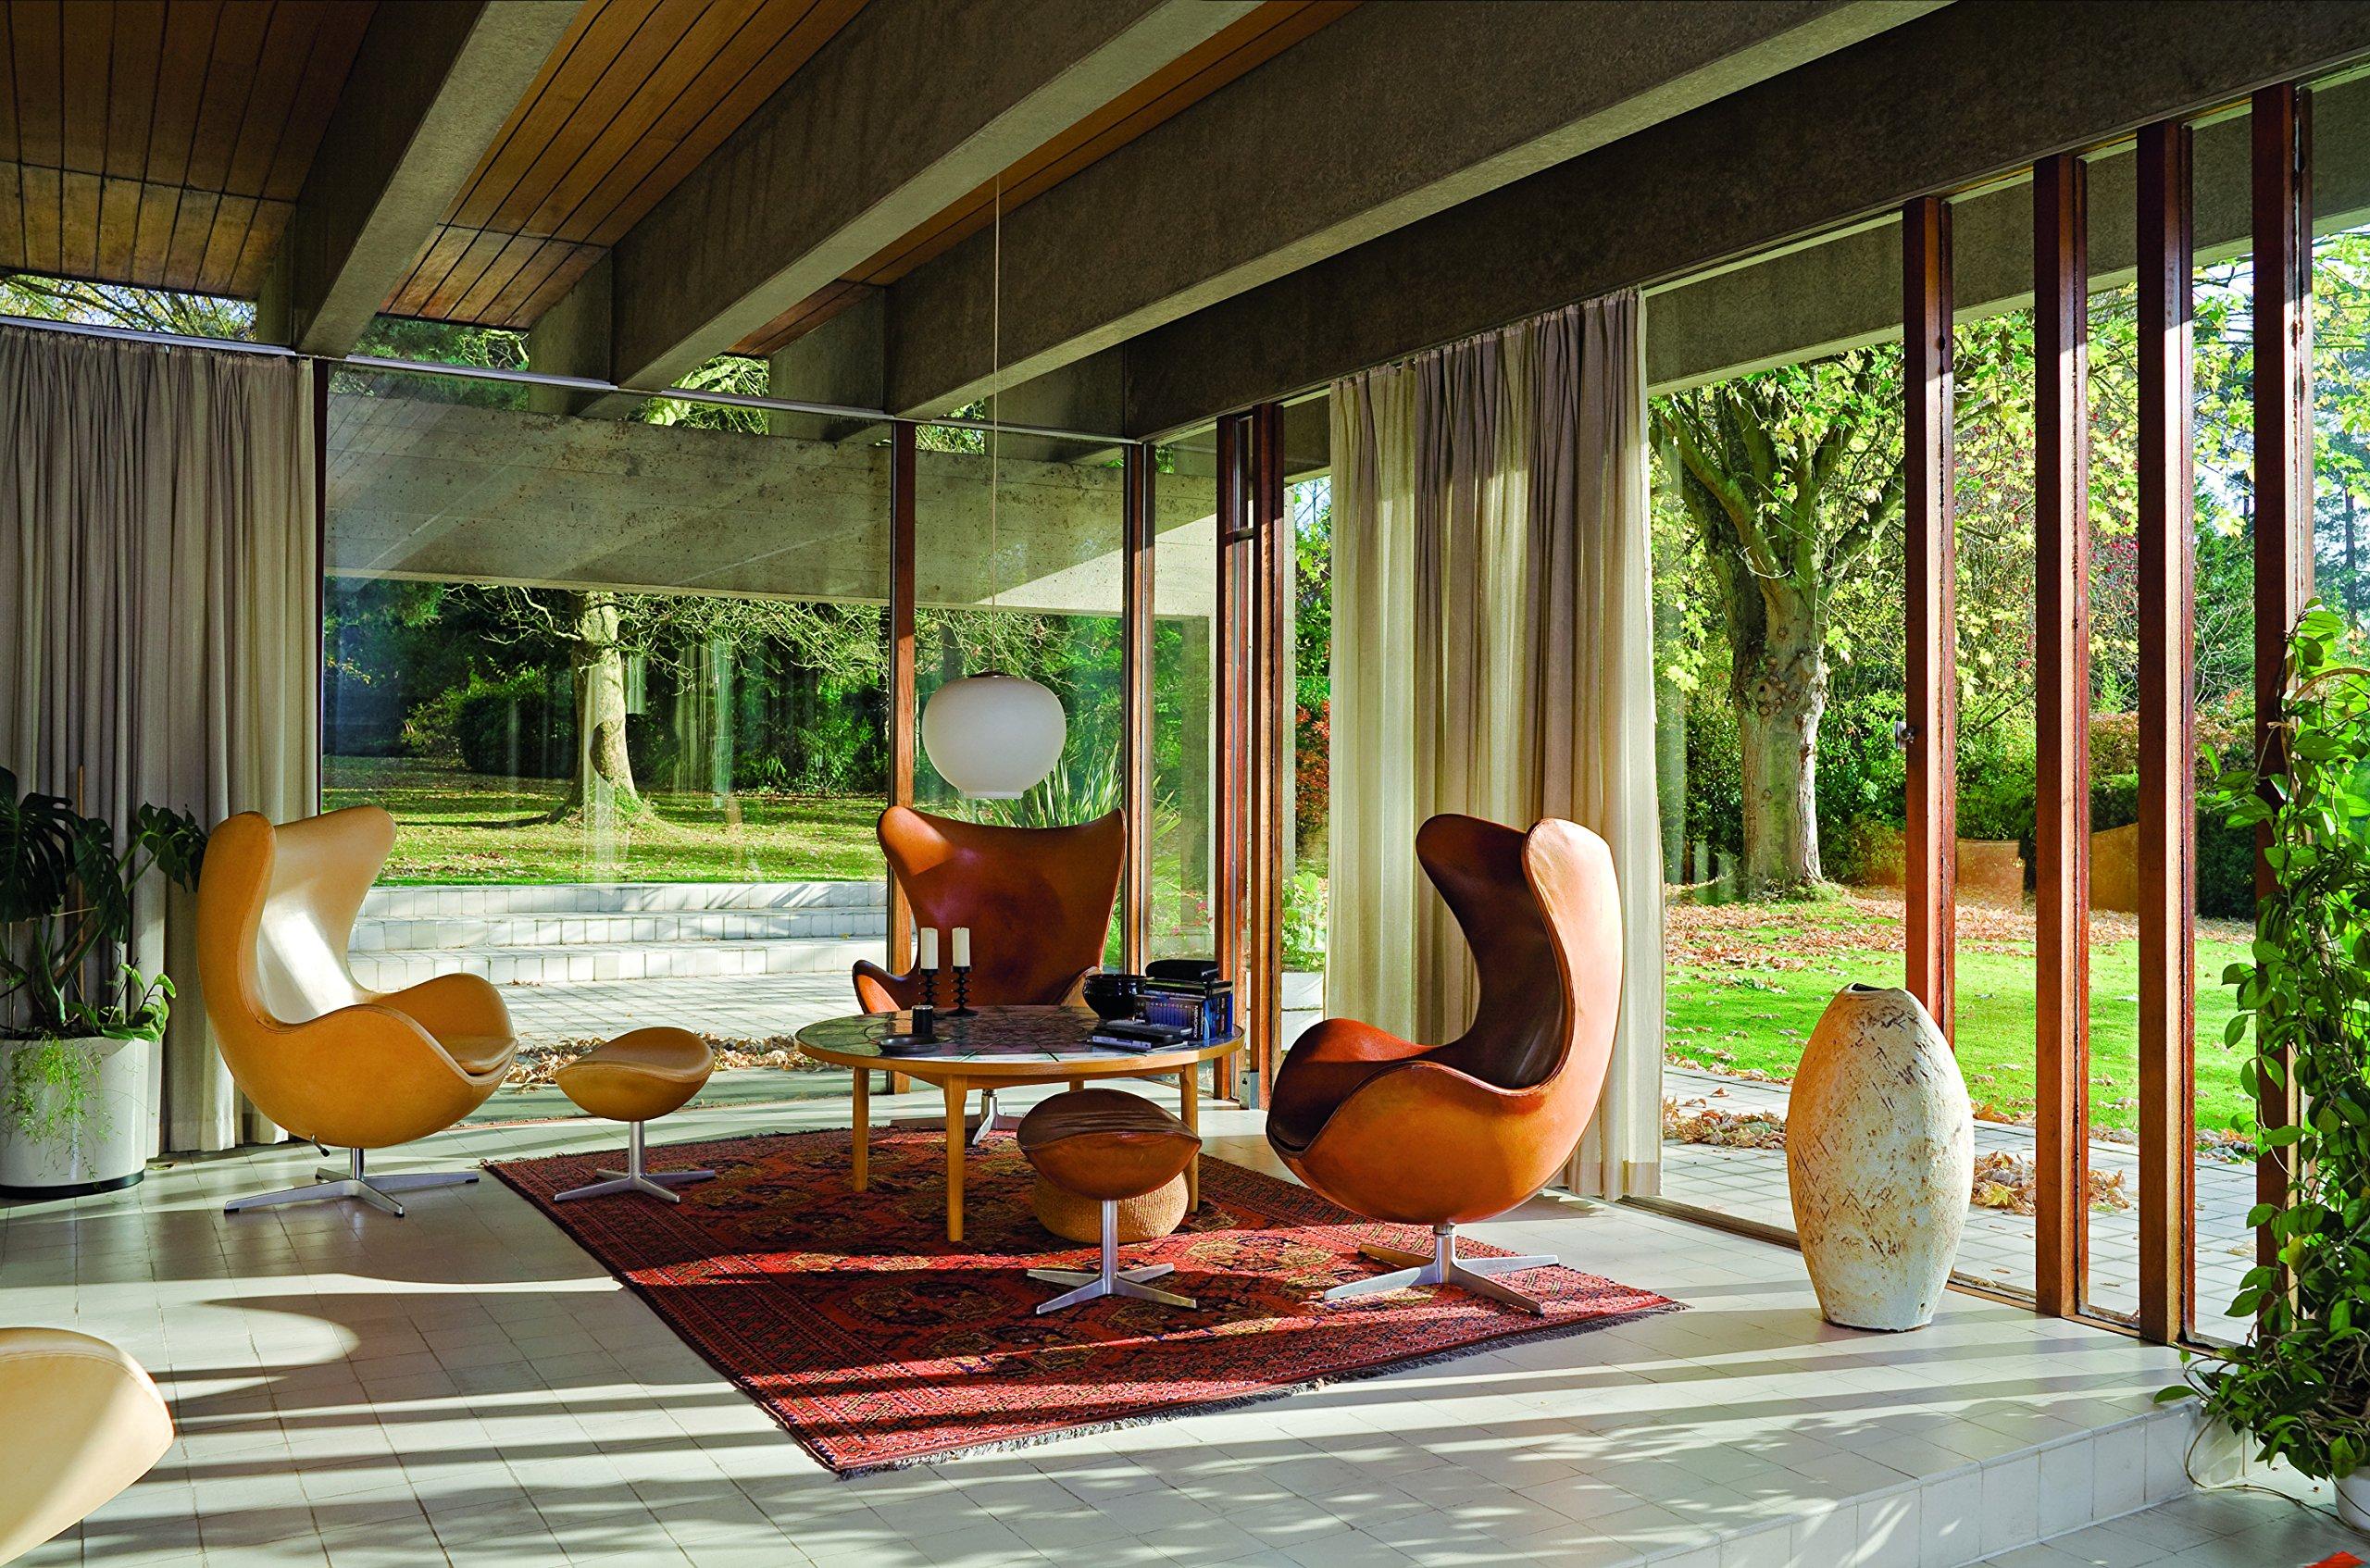 Scandinavian Home A Comprehensive Guide To Mid Century Modern Scandinavian Designers Amazon De Wilhide Elizabeth Fremdsprachige Bucher